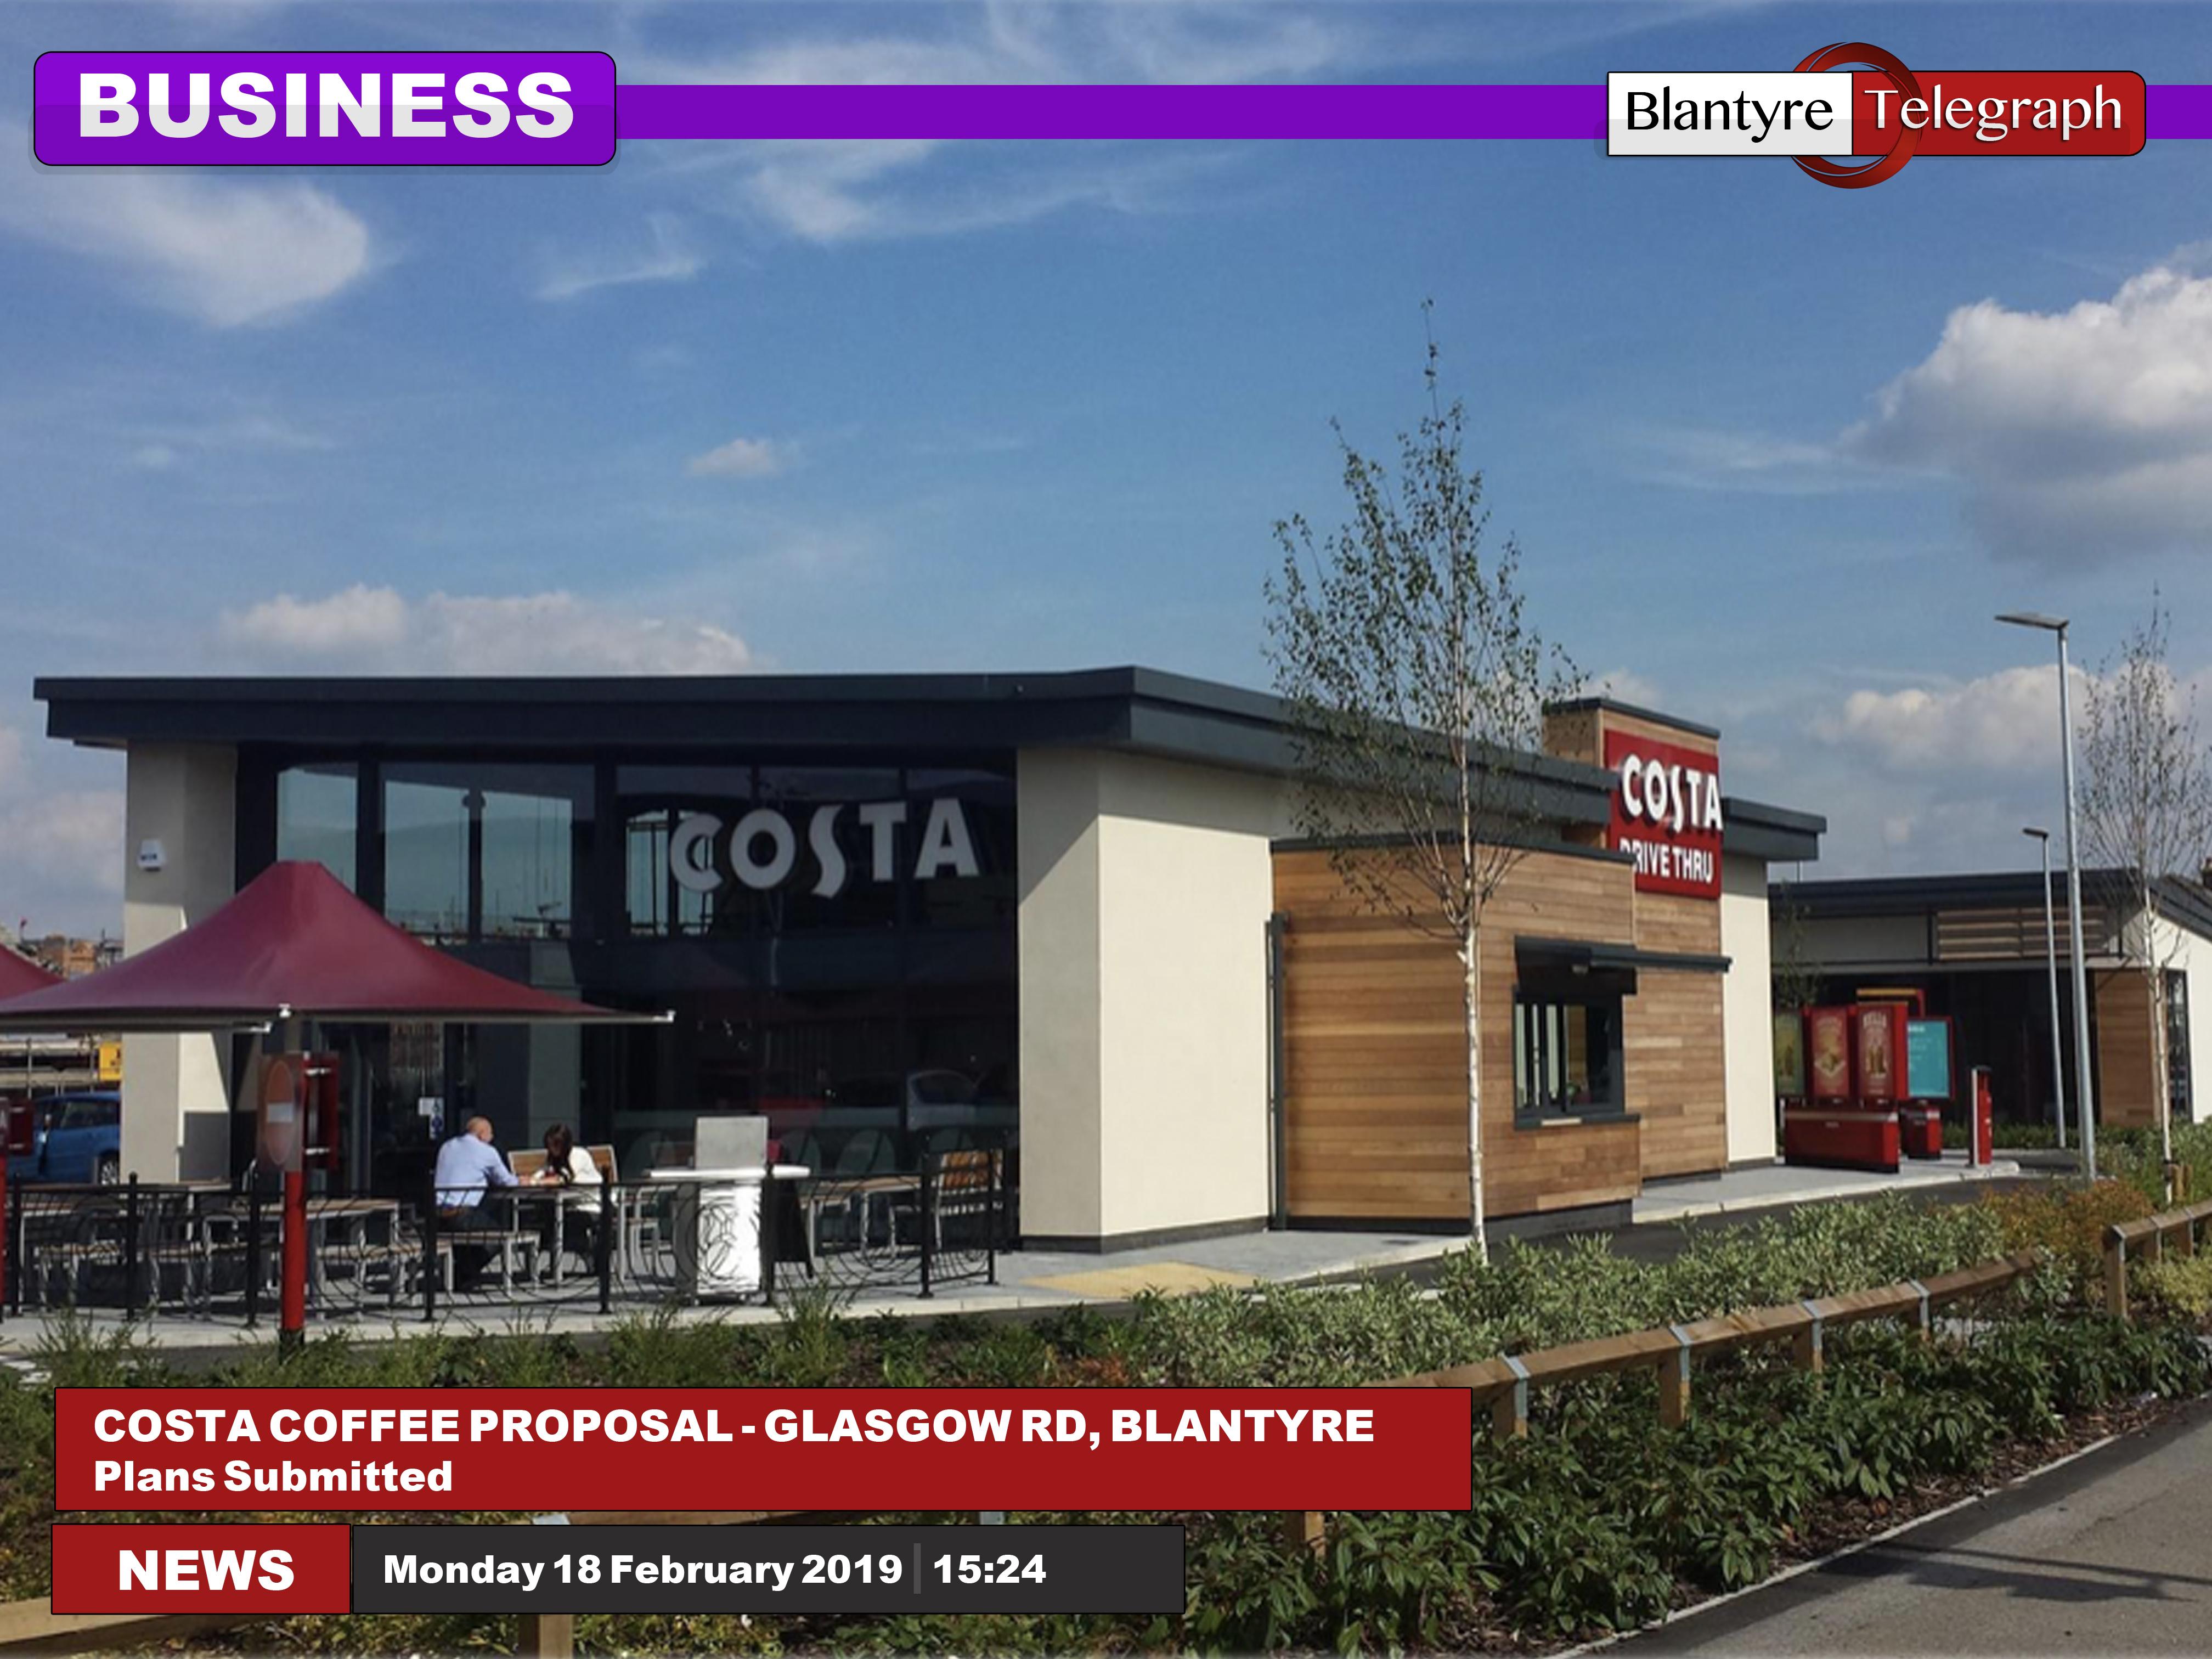 Costa Coffee Plans Blantyre Telegraph News For Community